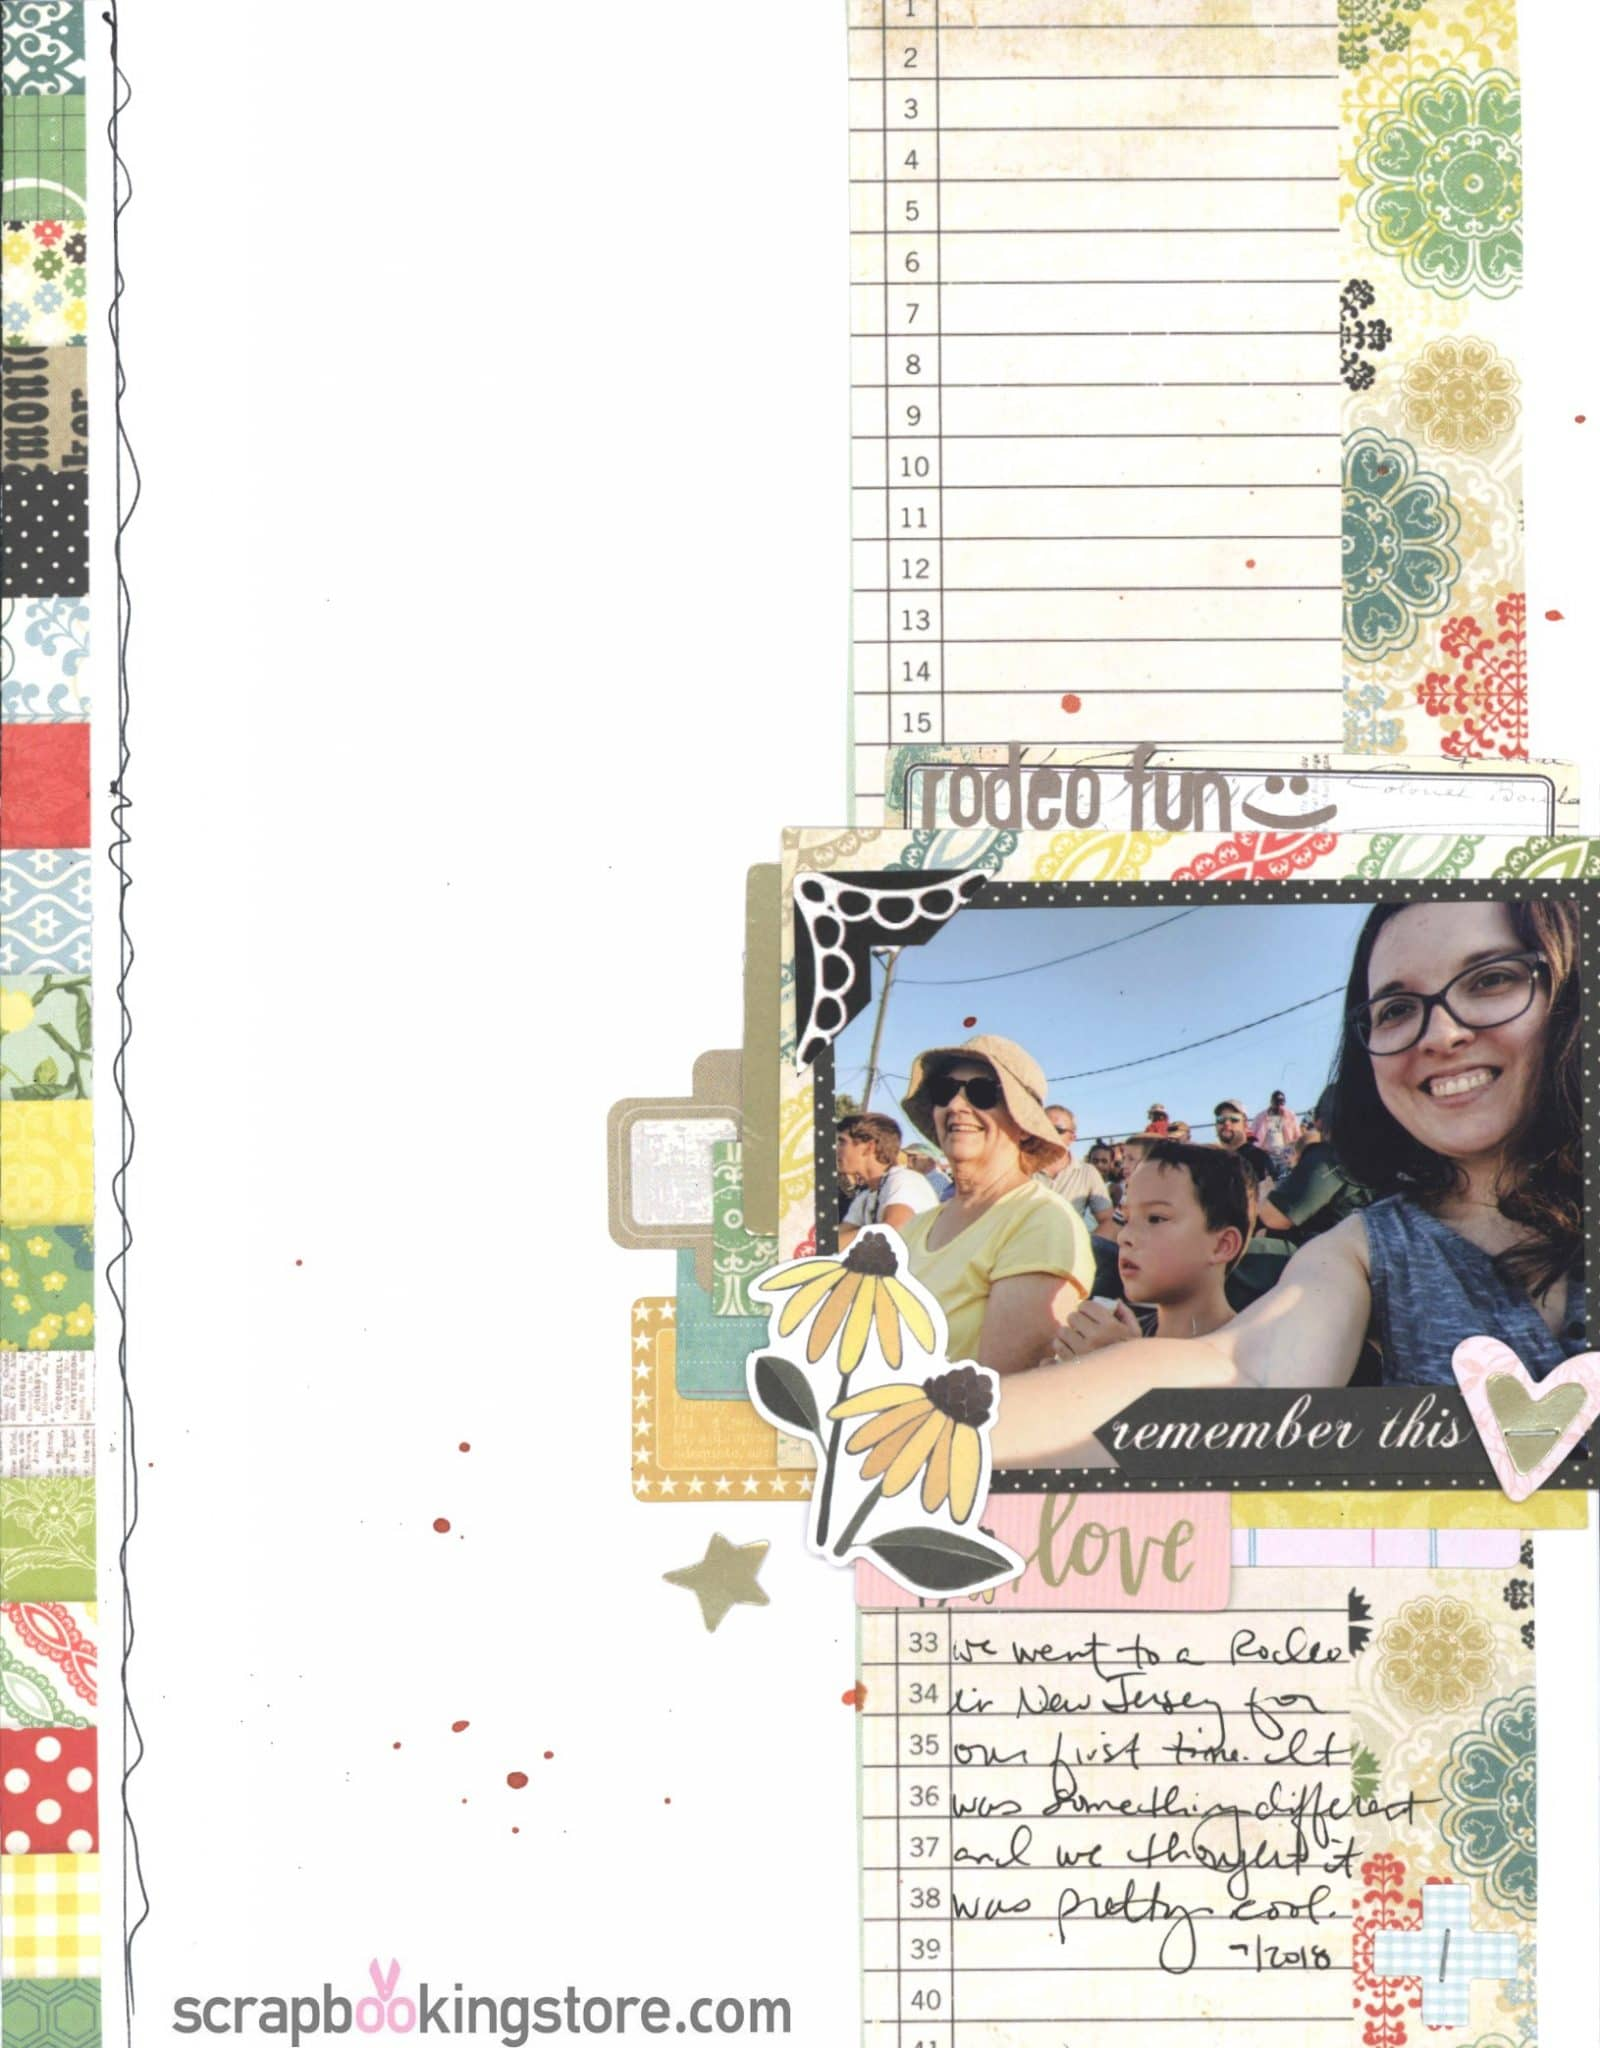 ScrapbookingStore - Nicole favorite layout